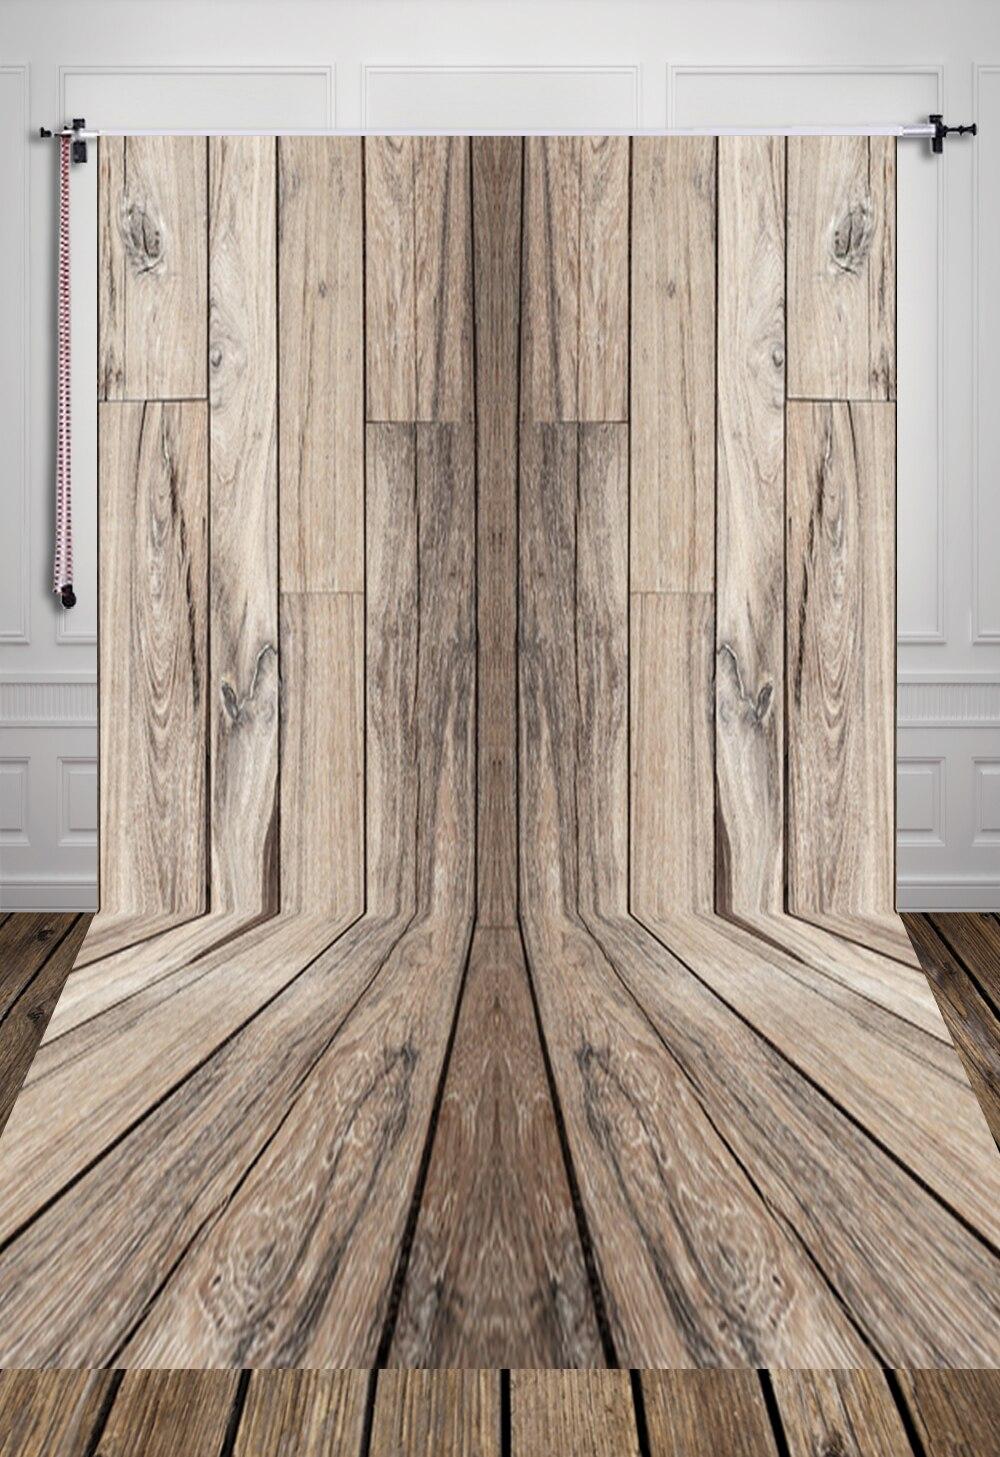 ᗛgrey wood planks photography backdrop wood floor custom photo prop